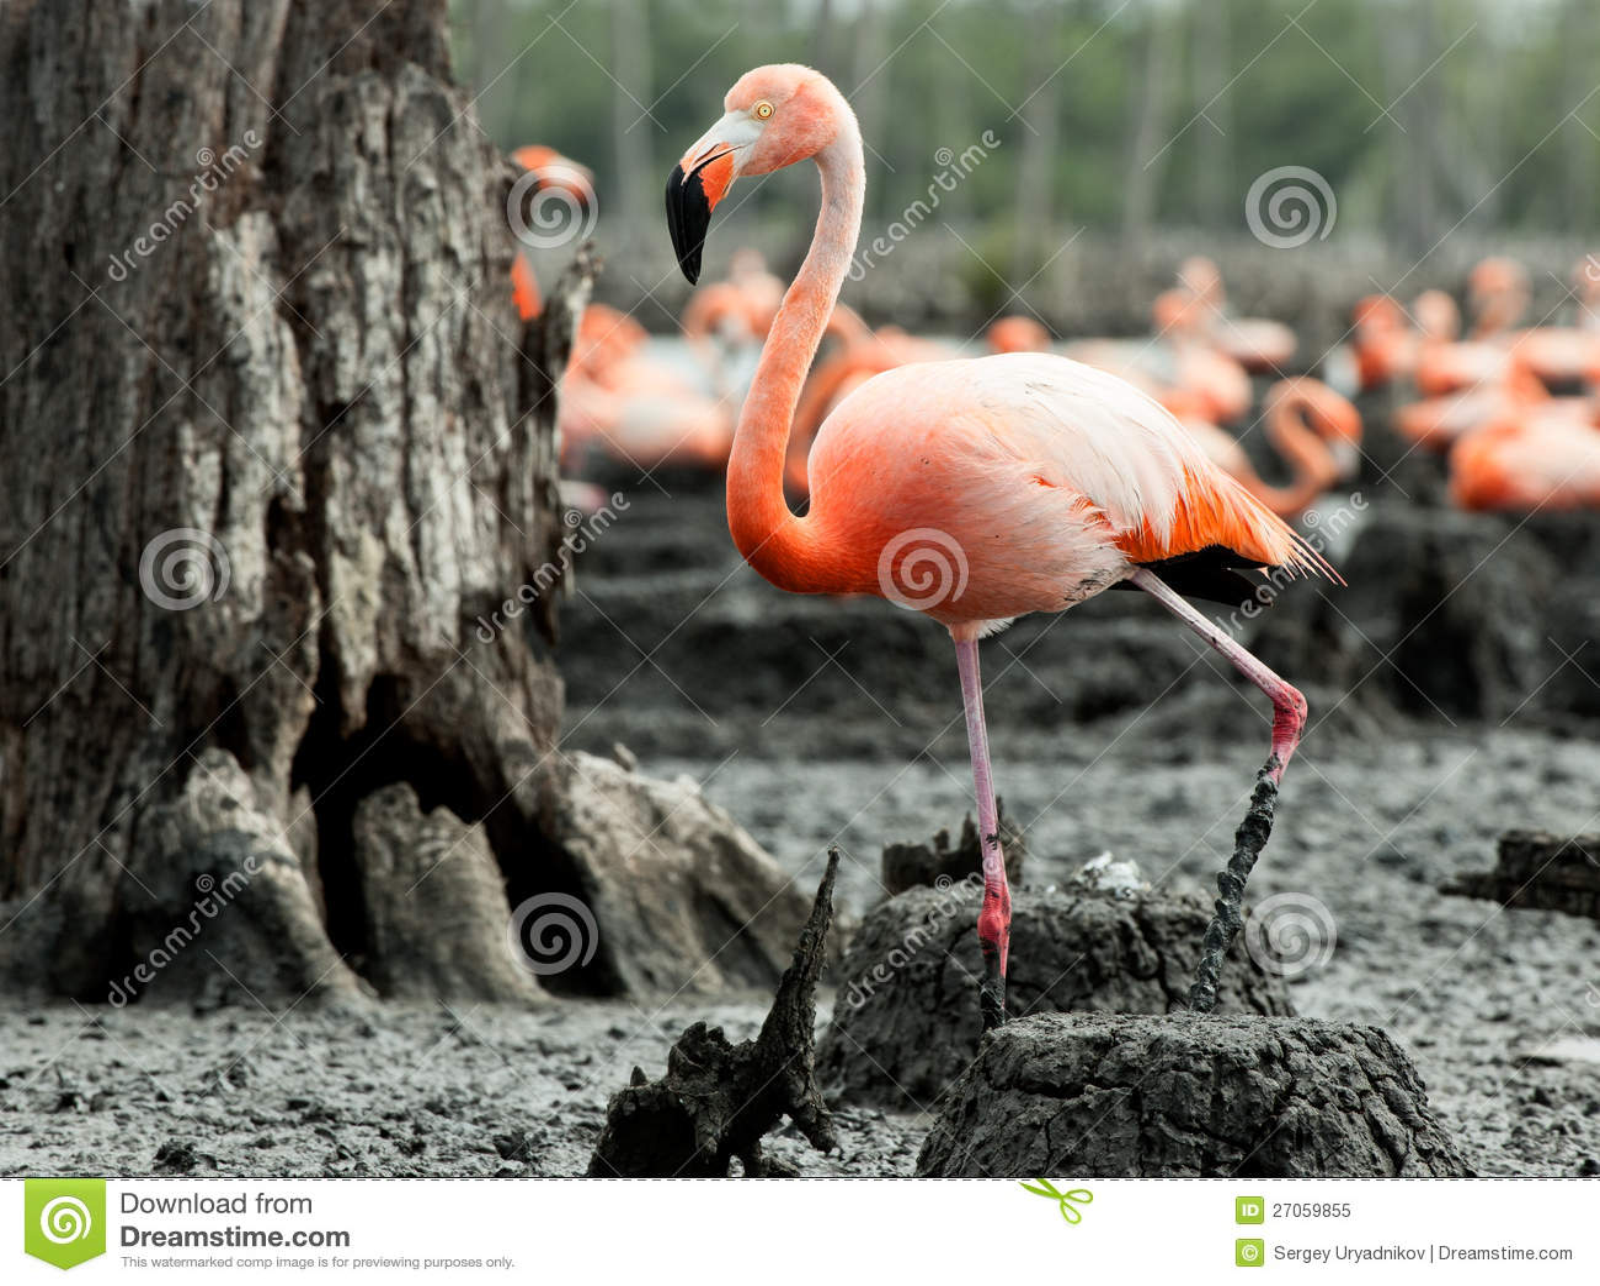 Flamingo nest - photo#39